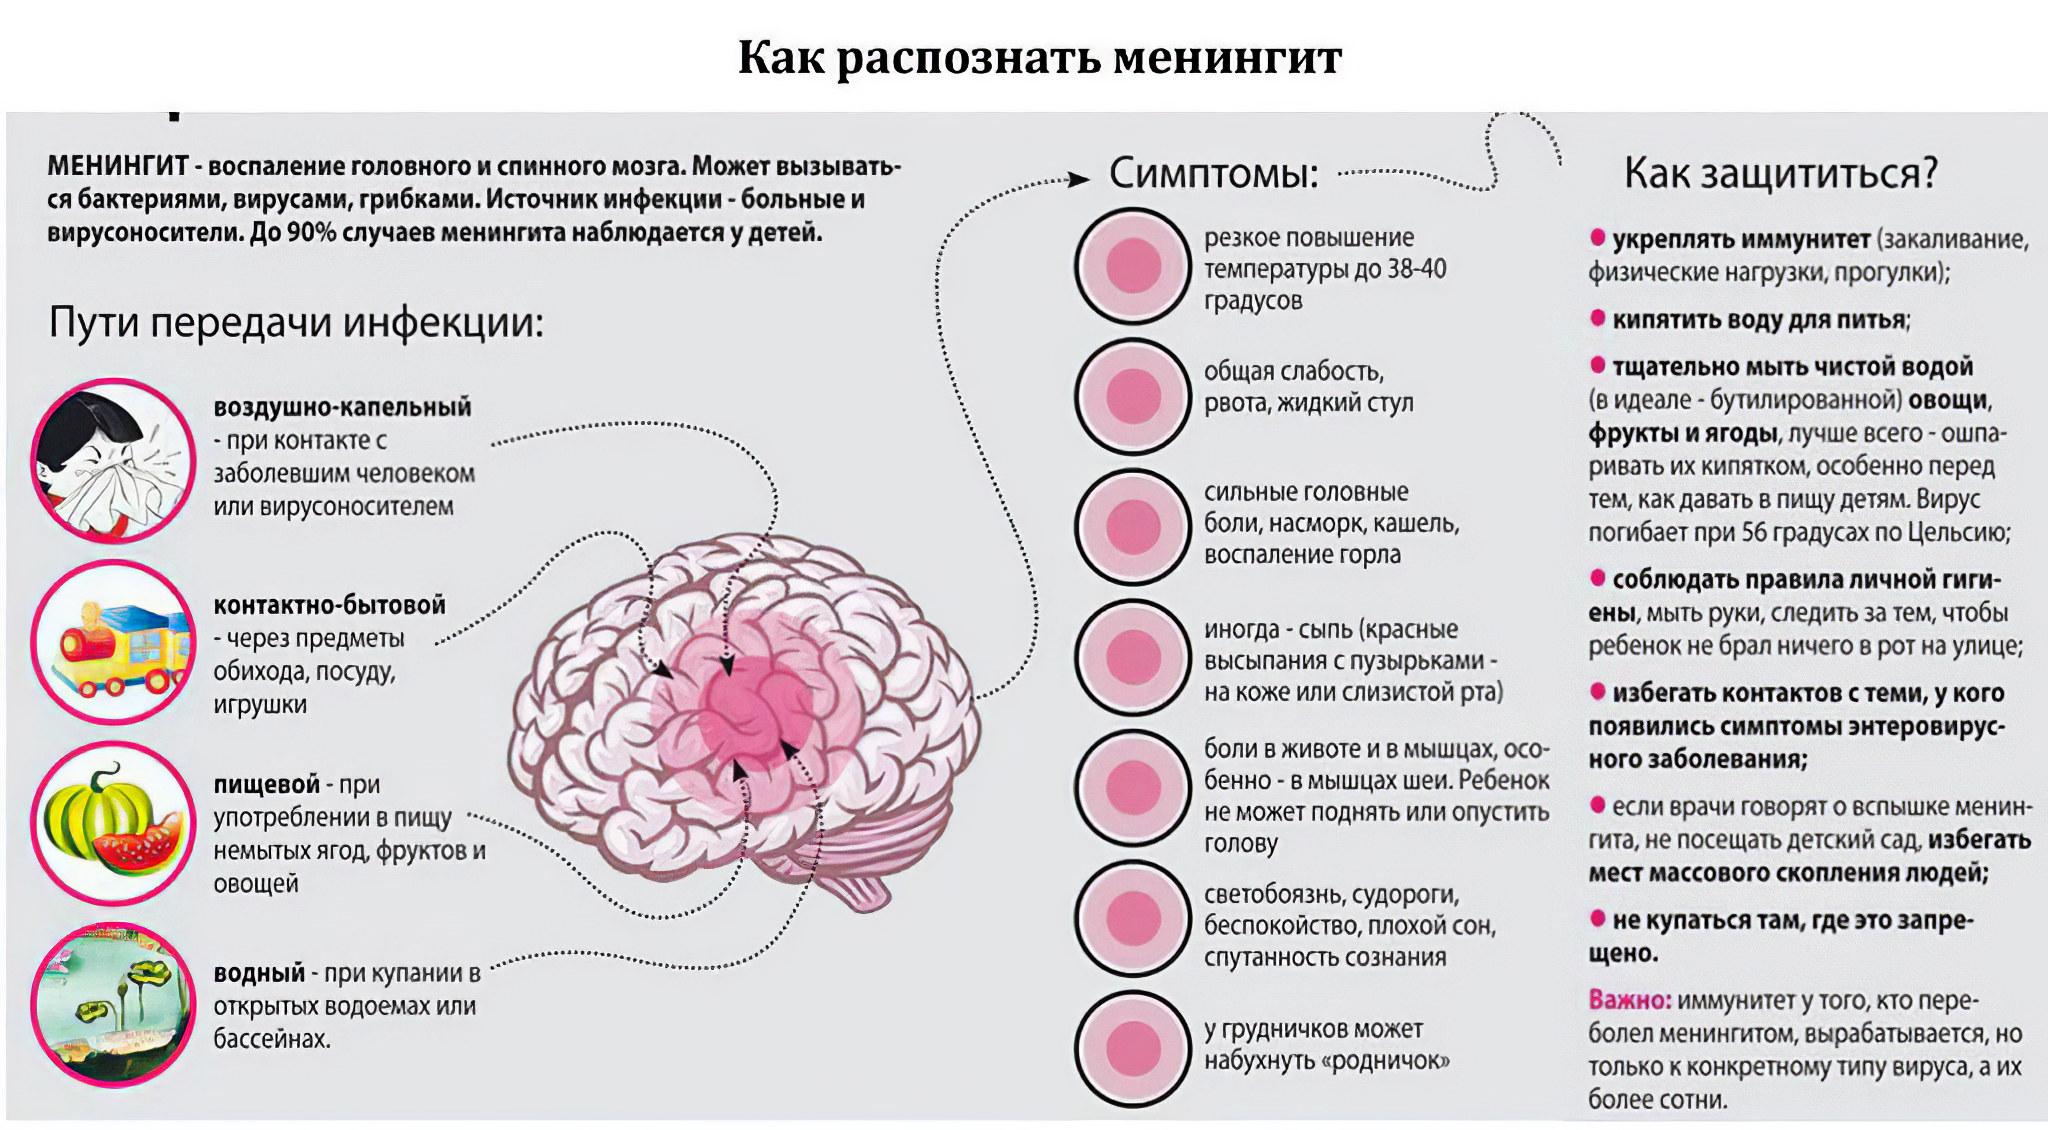 Менингит профилактика картинки